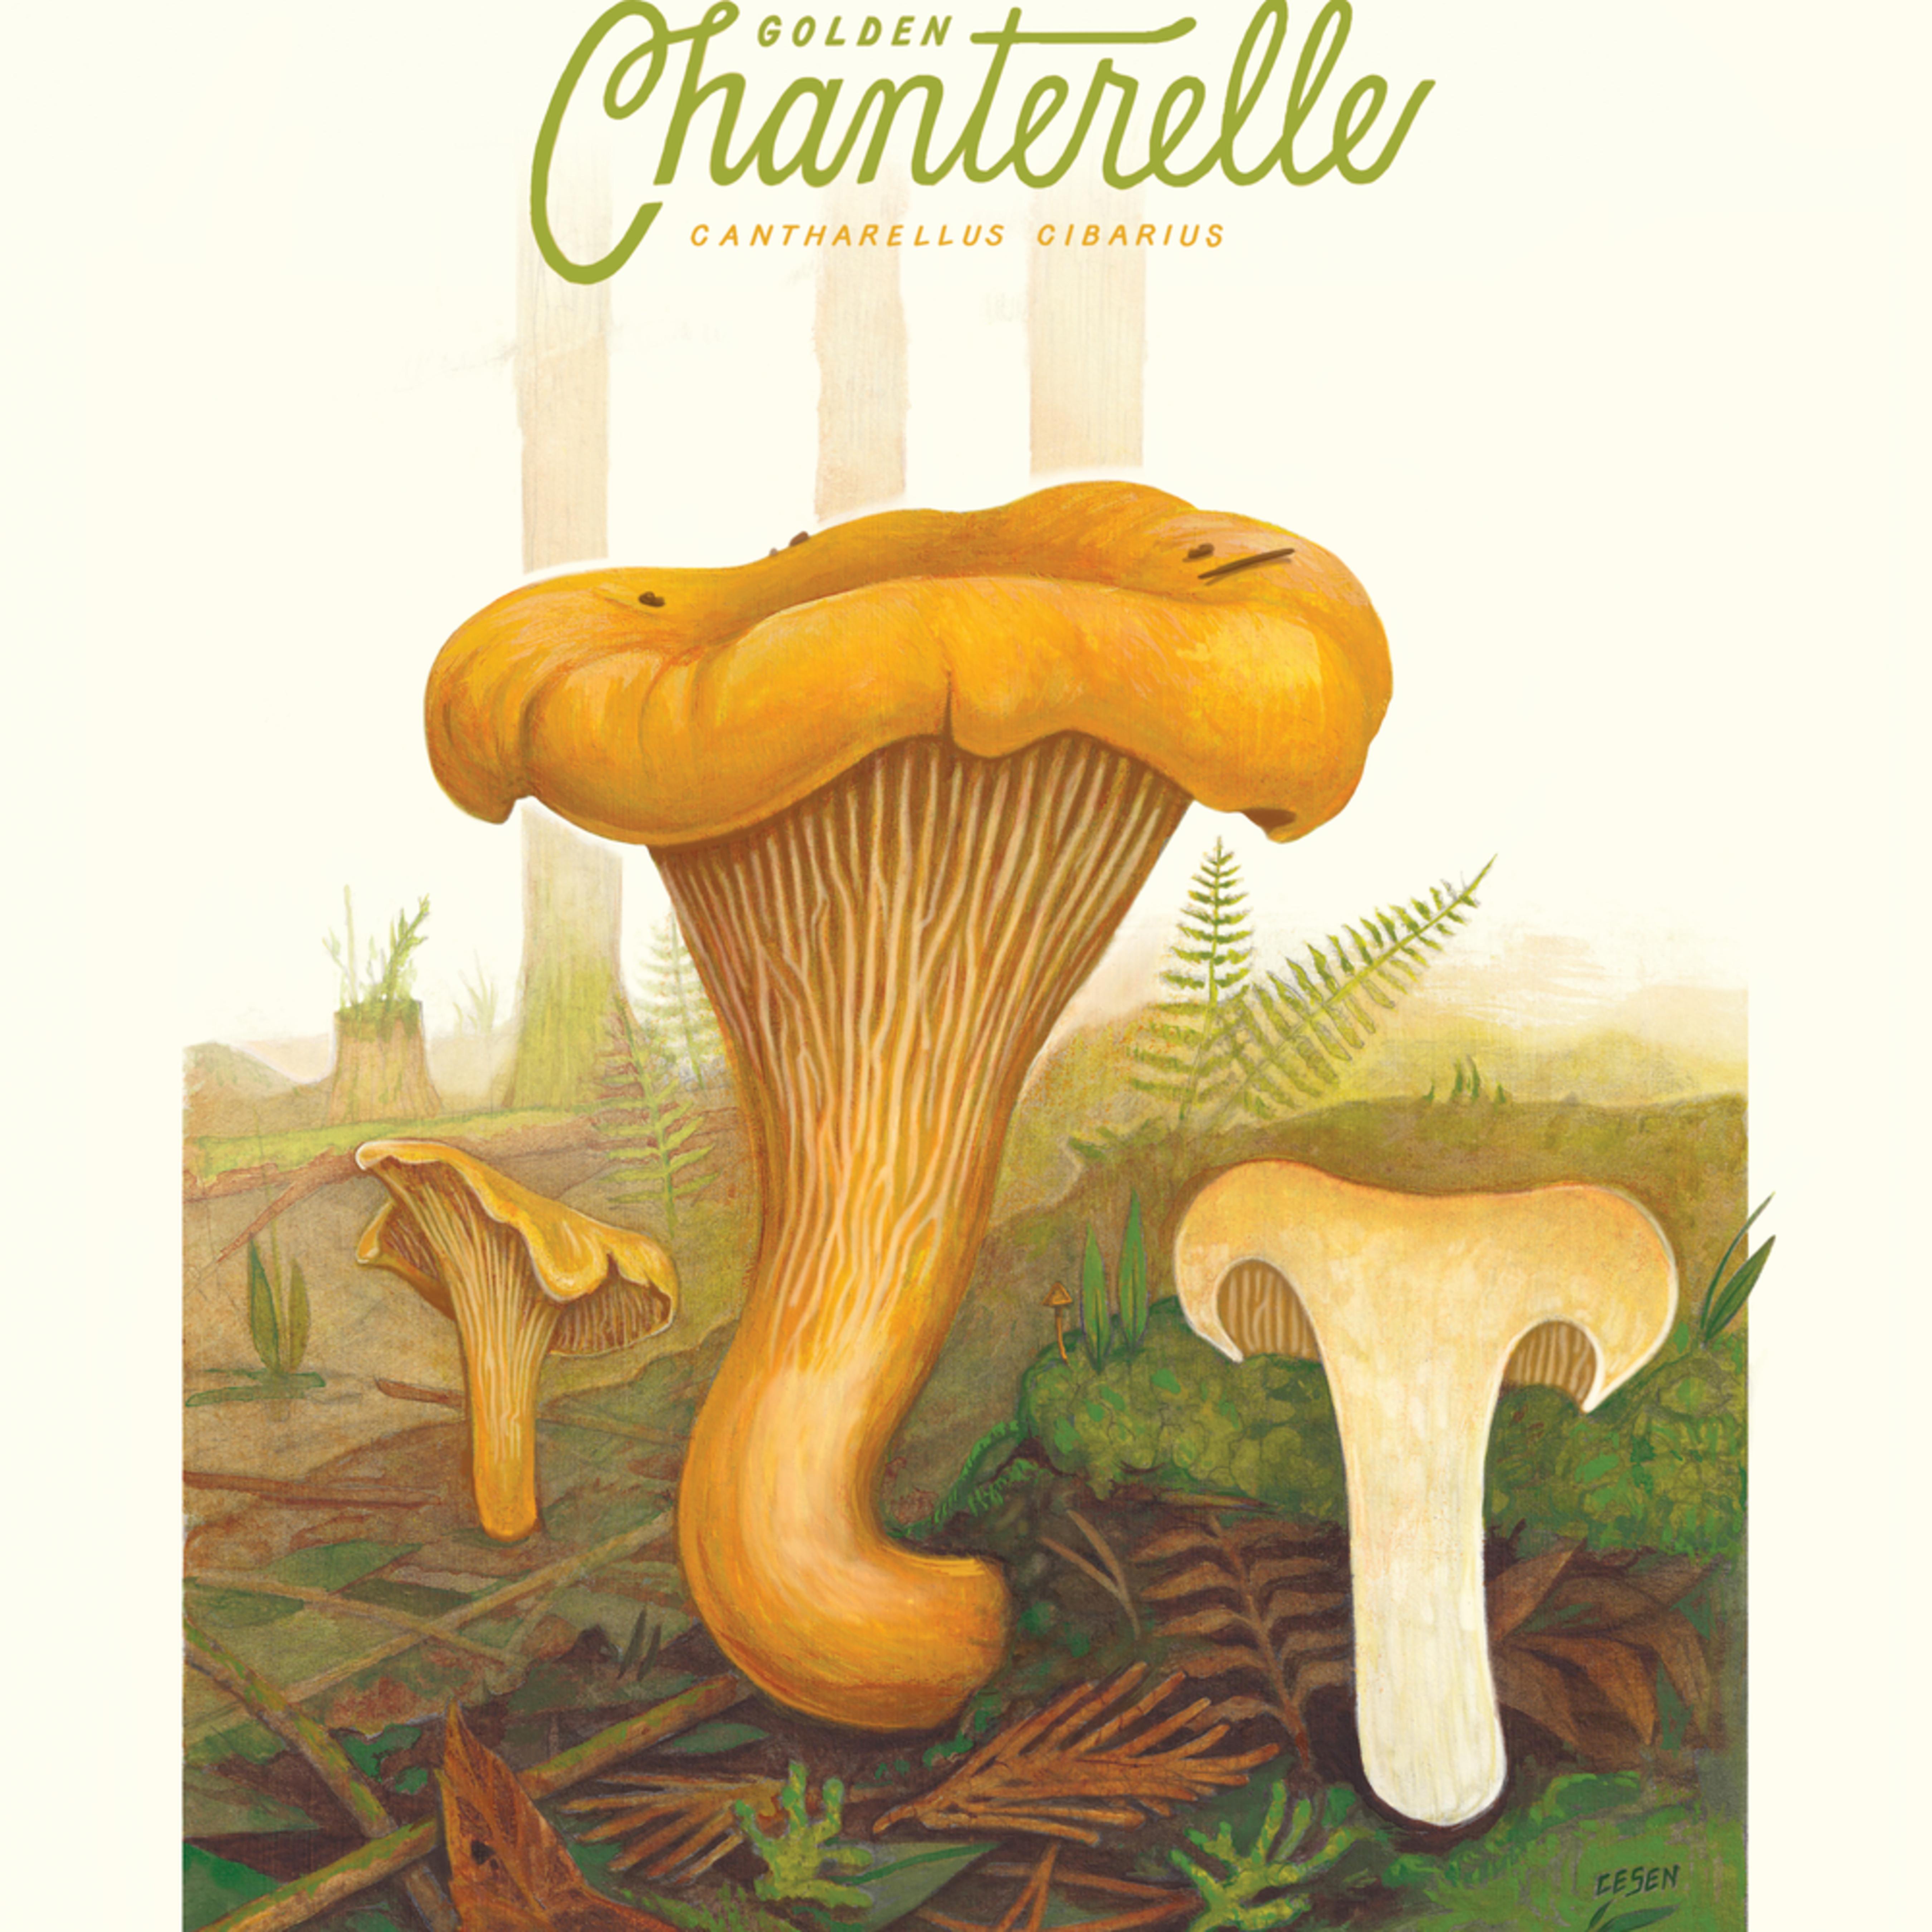 Chanterellemushroom botanicaldrawing 18x24 print qiwpql